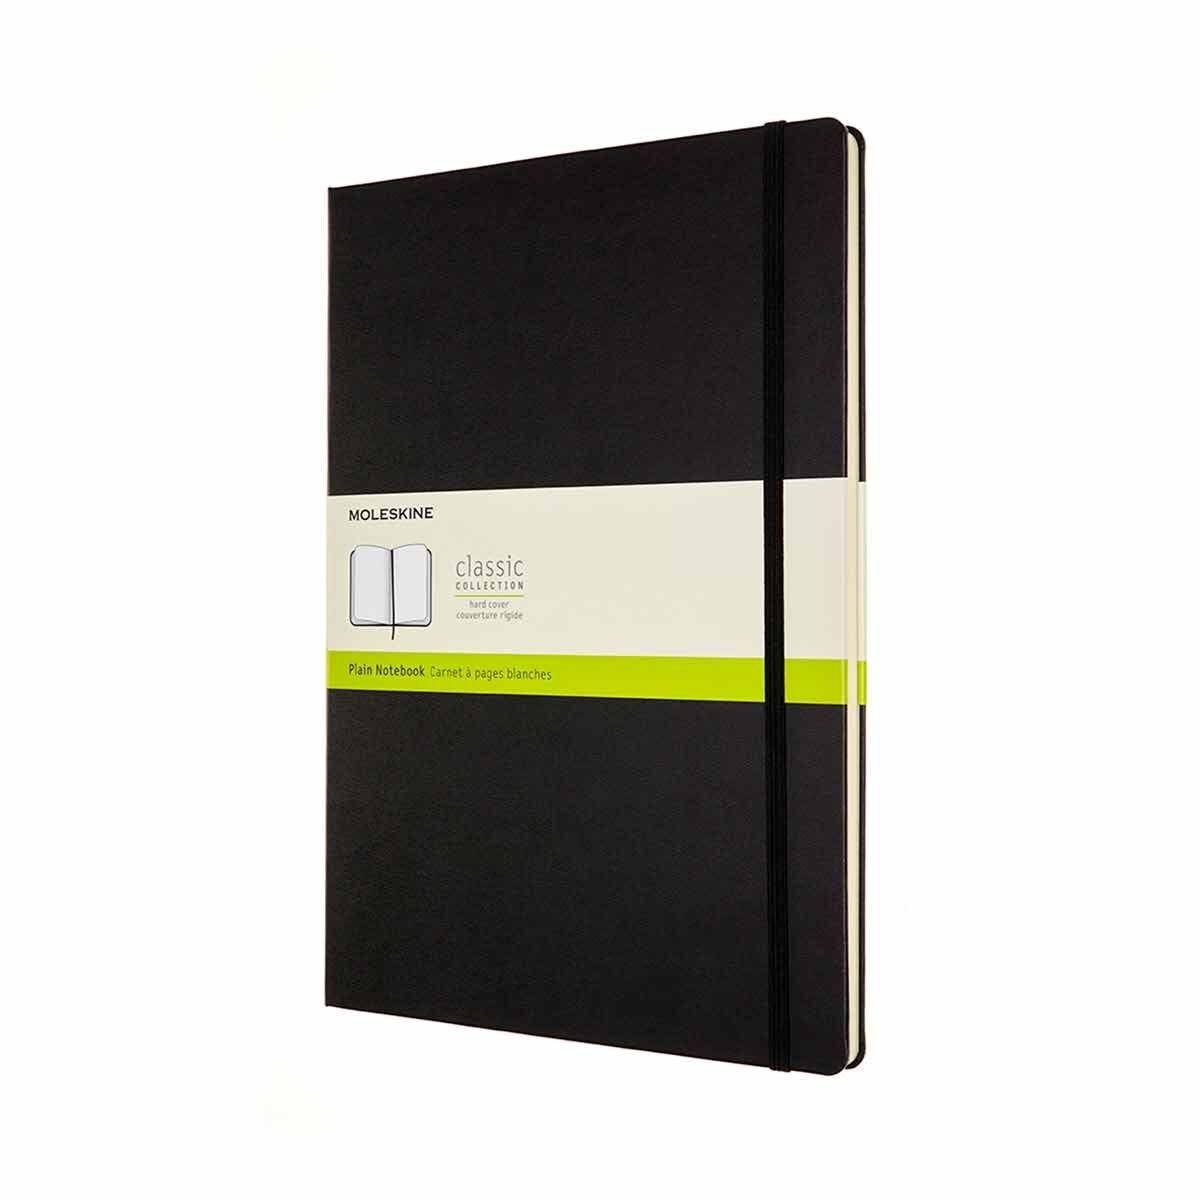 Moleskine Hardcover Notebook A4 Plain Black